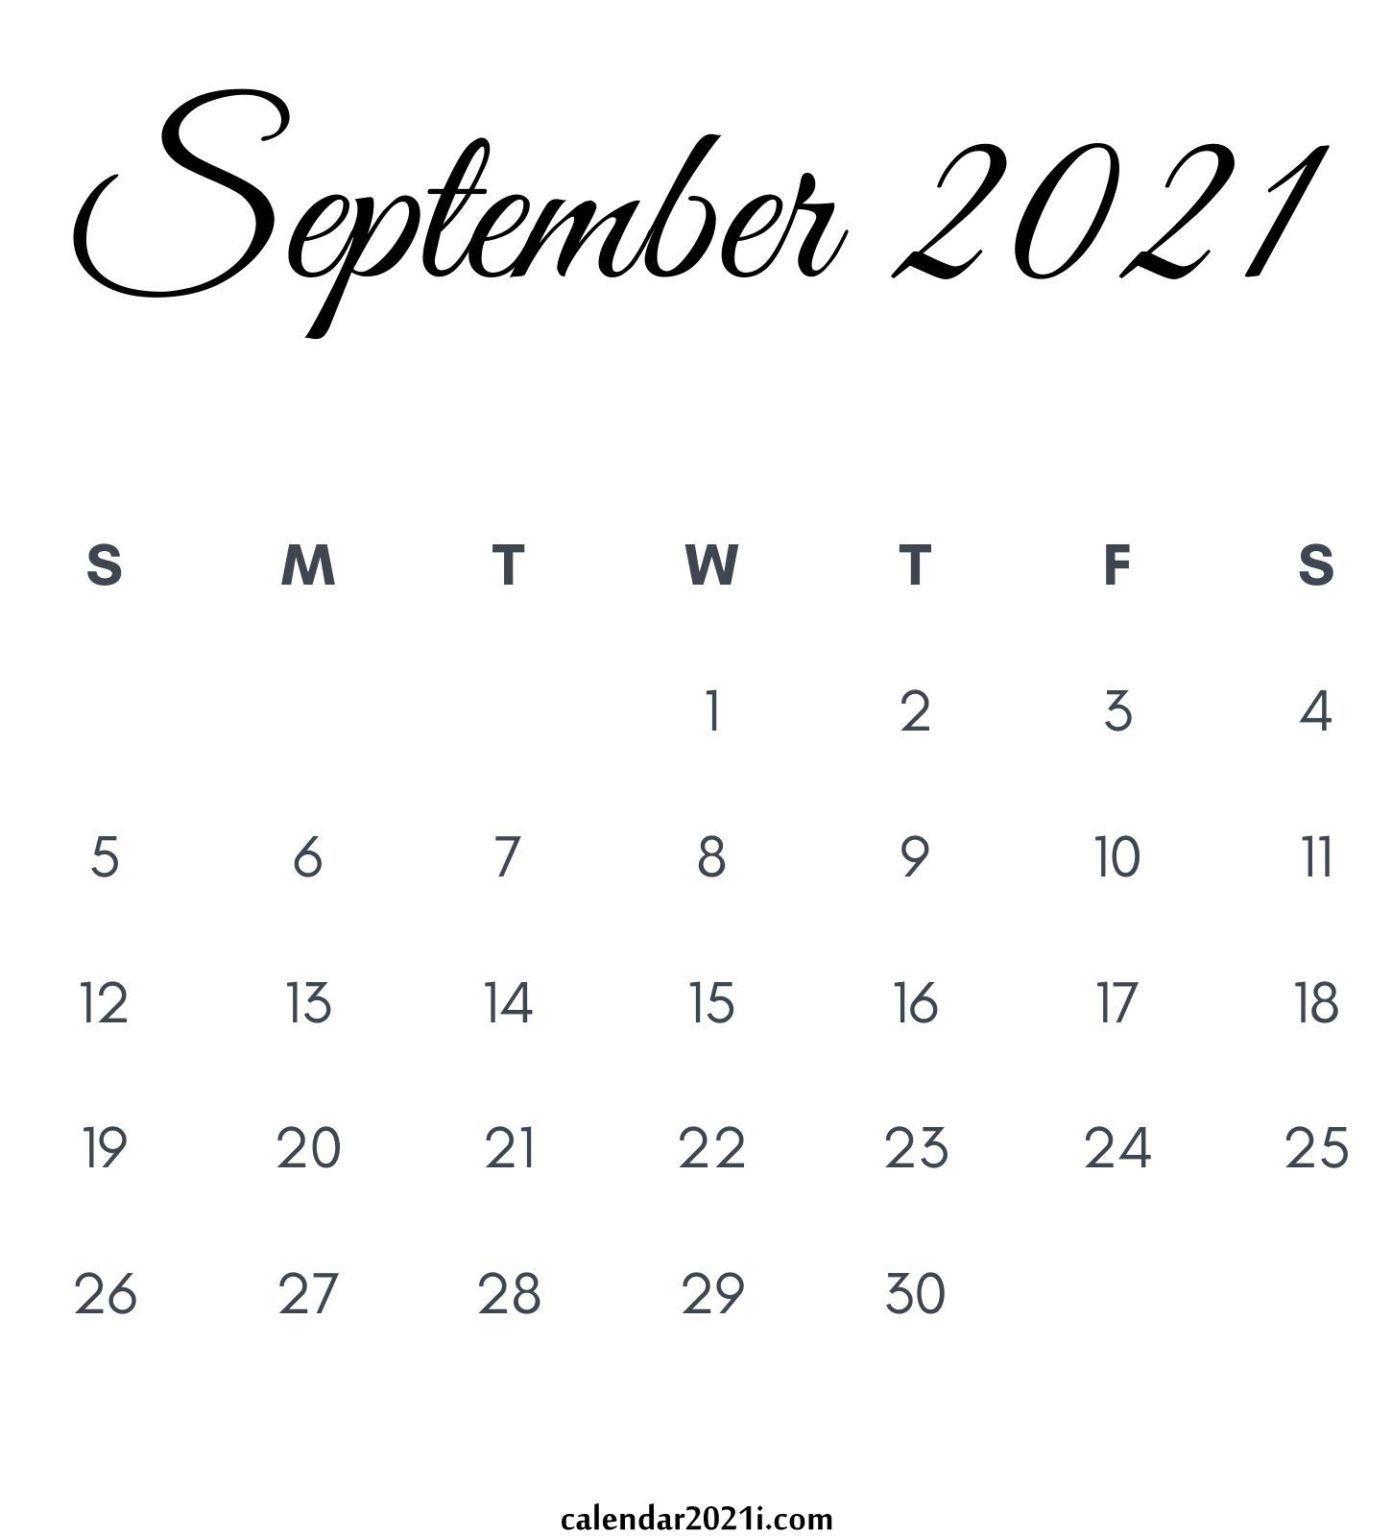 September 2021 Calendar Printable In 2020 | Monthly Calendar